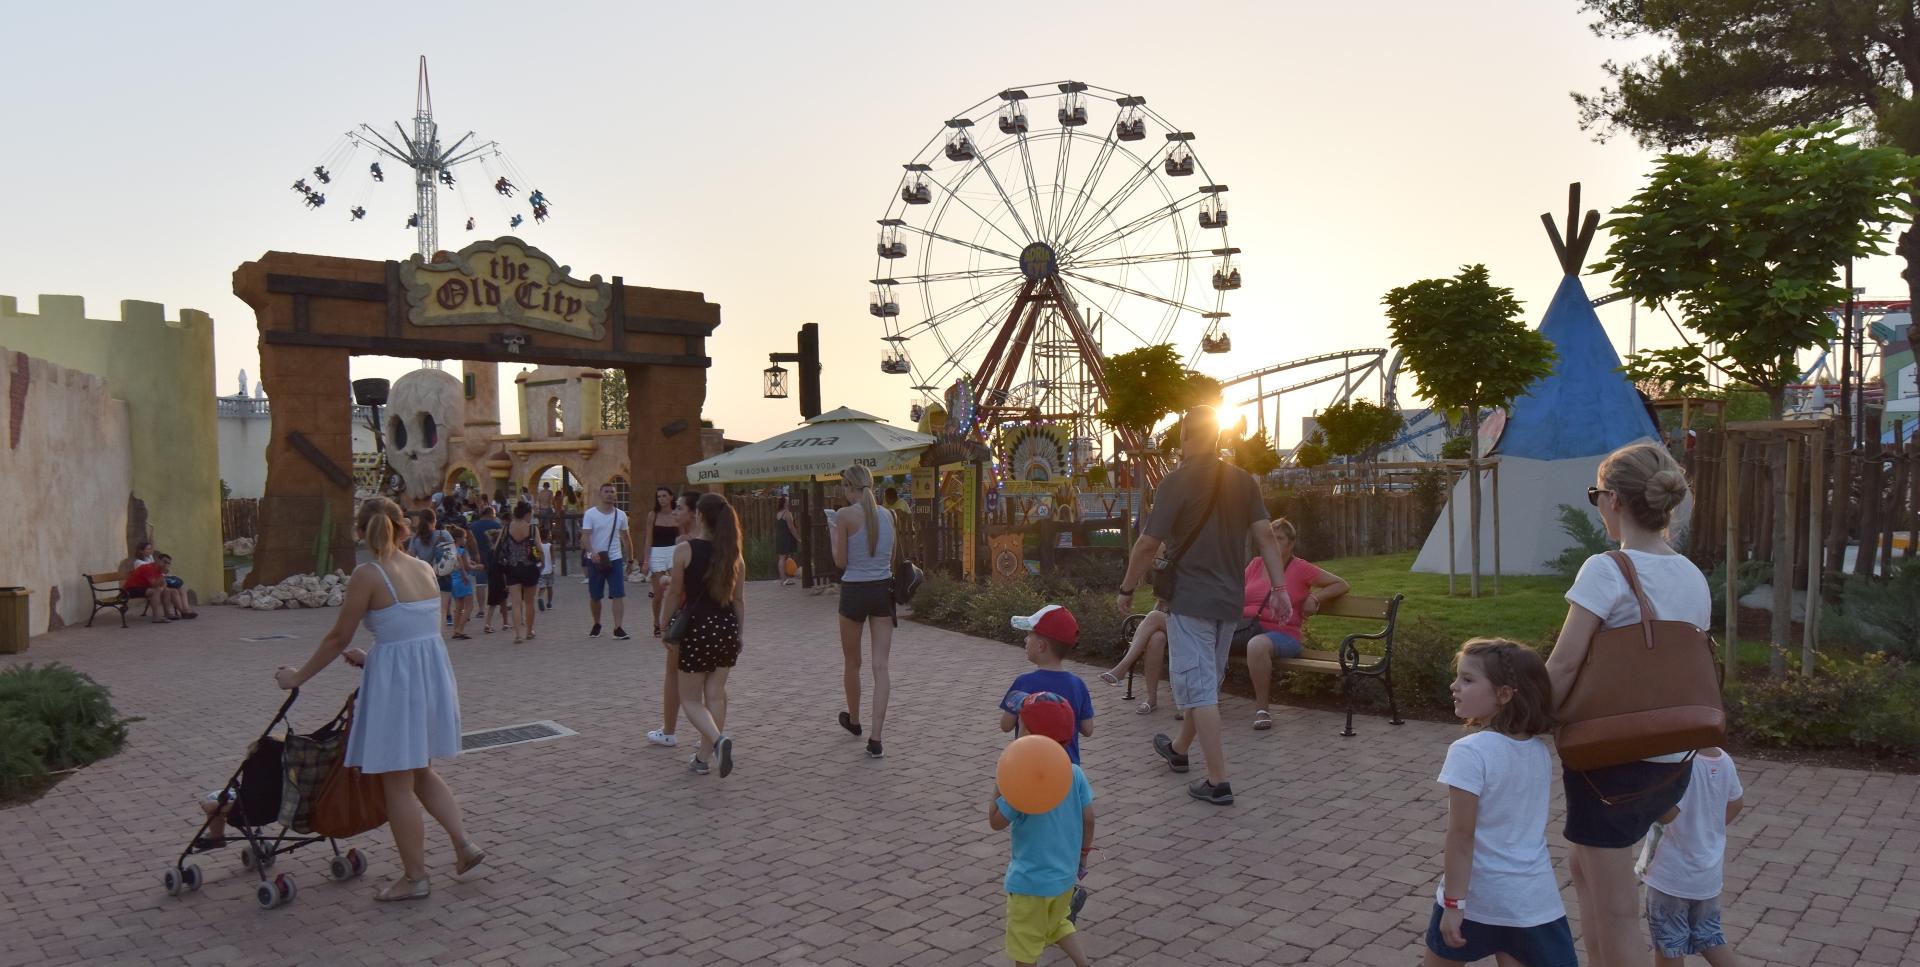 FOTO: FUN PARK MIRNOVEC Prvi tematsko-zabavni park u Republici Hrvatskoj